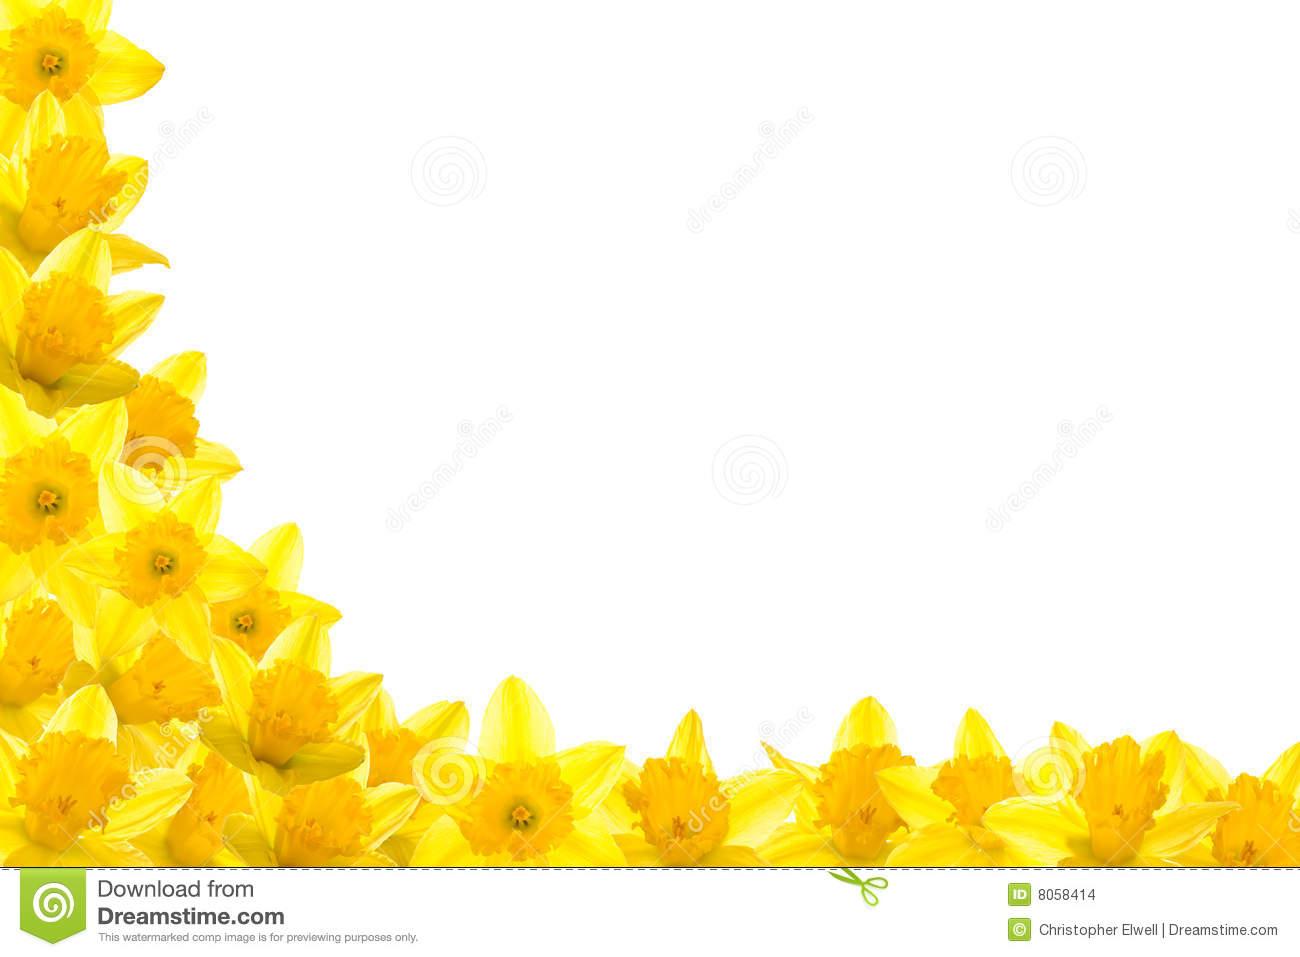 Daffodil border clipart graphic freeuse download Daffodil border clipart 7 » Clipart Station graphic freeuse download